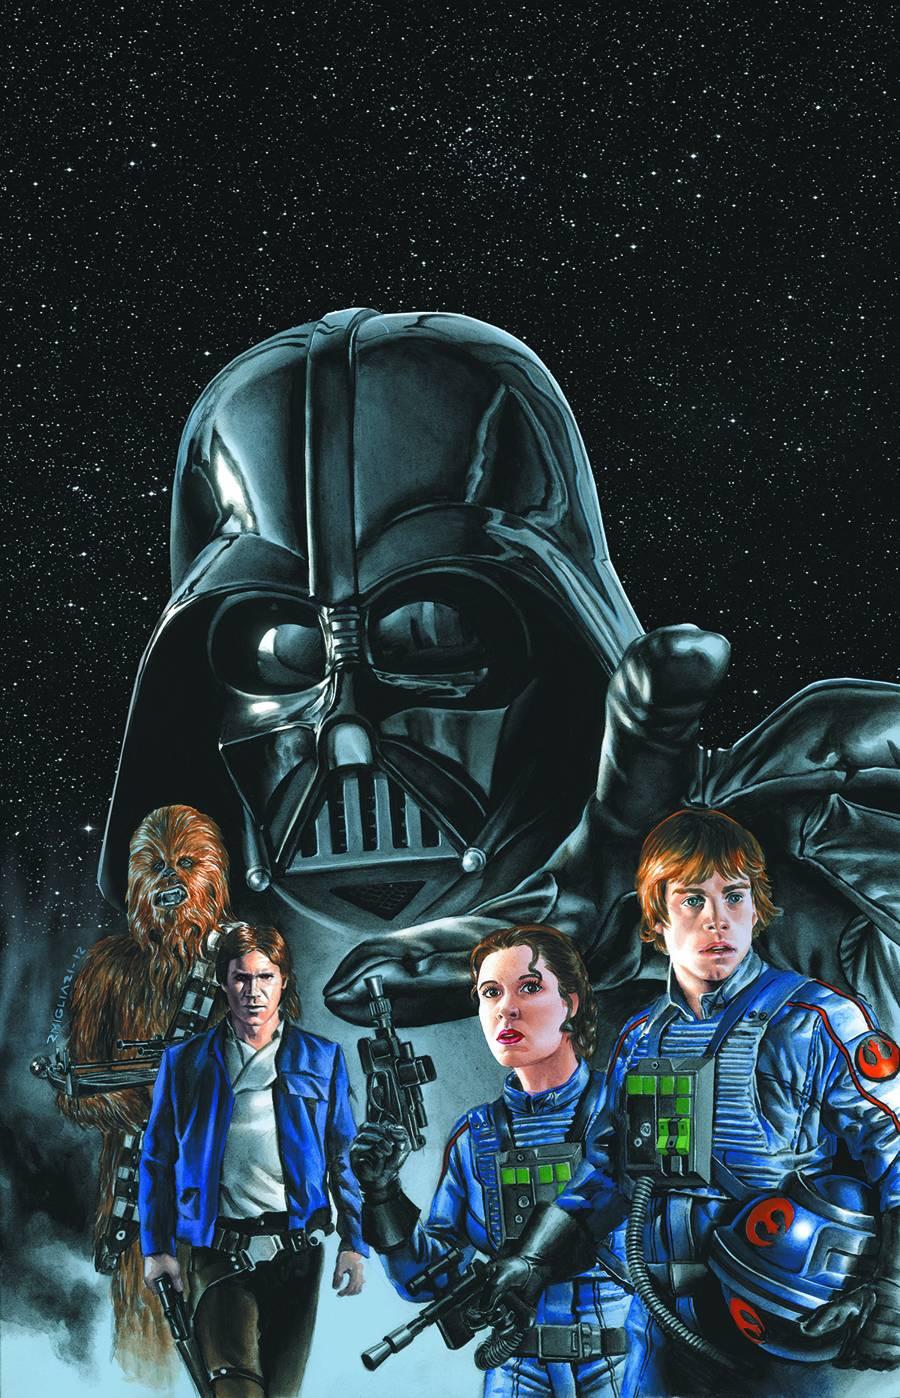 Star Wars Luke Skywalker Comic 900x1398 Wallpaper Teahub Io